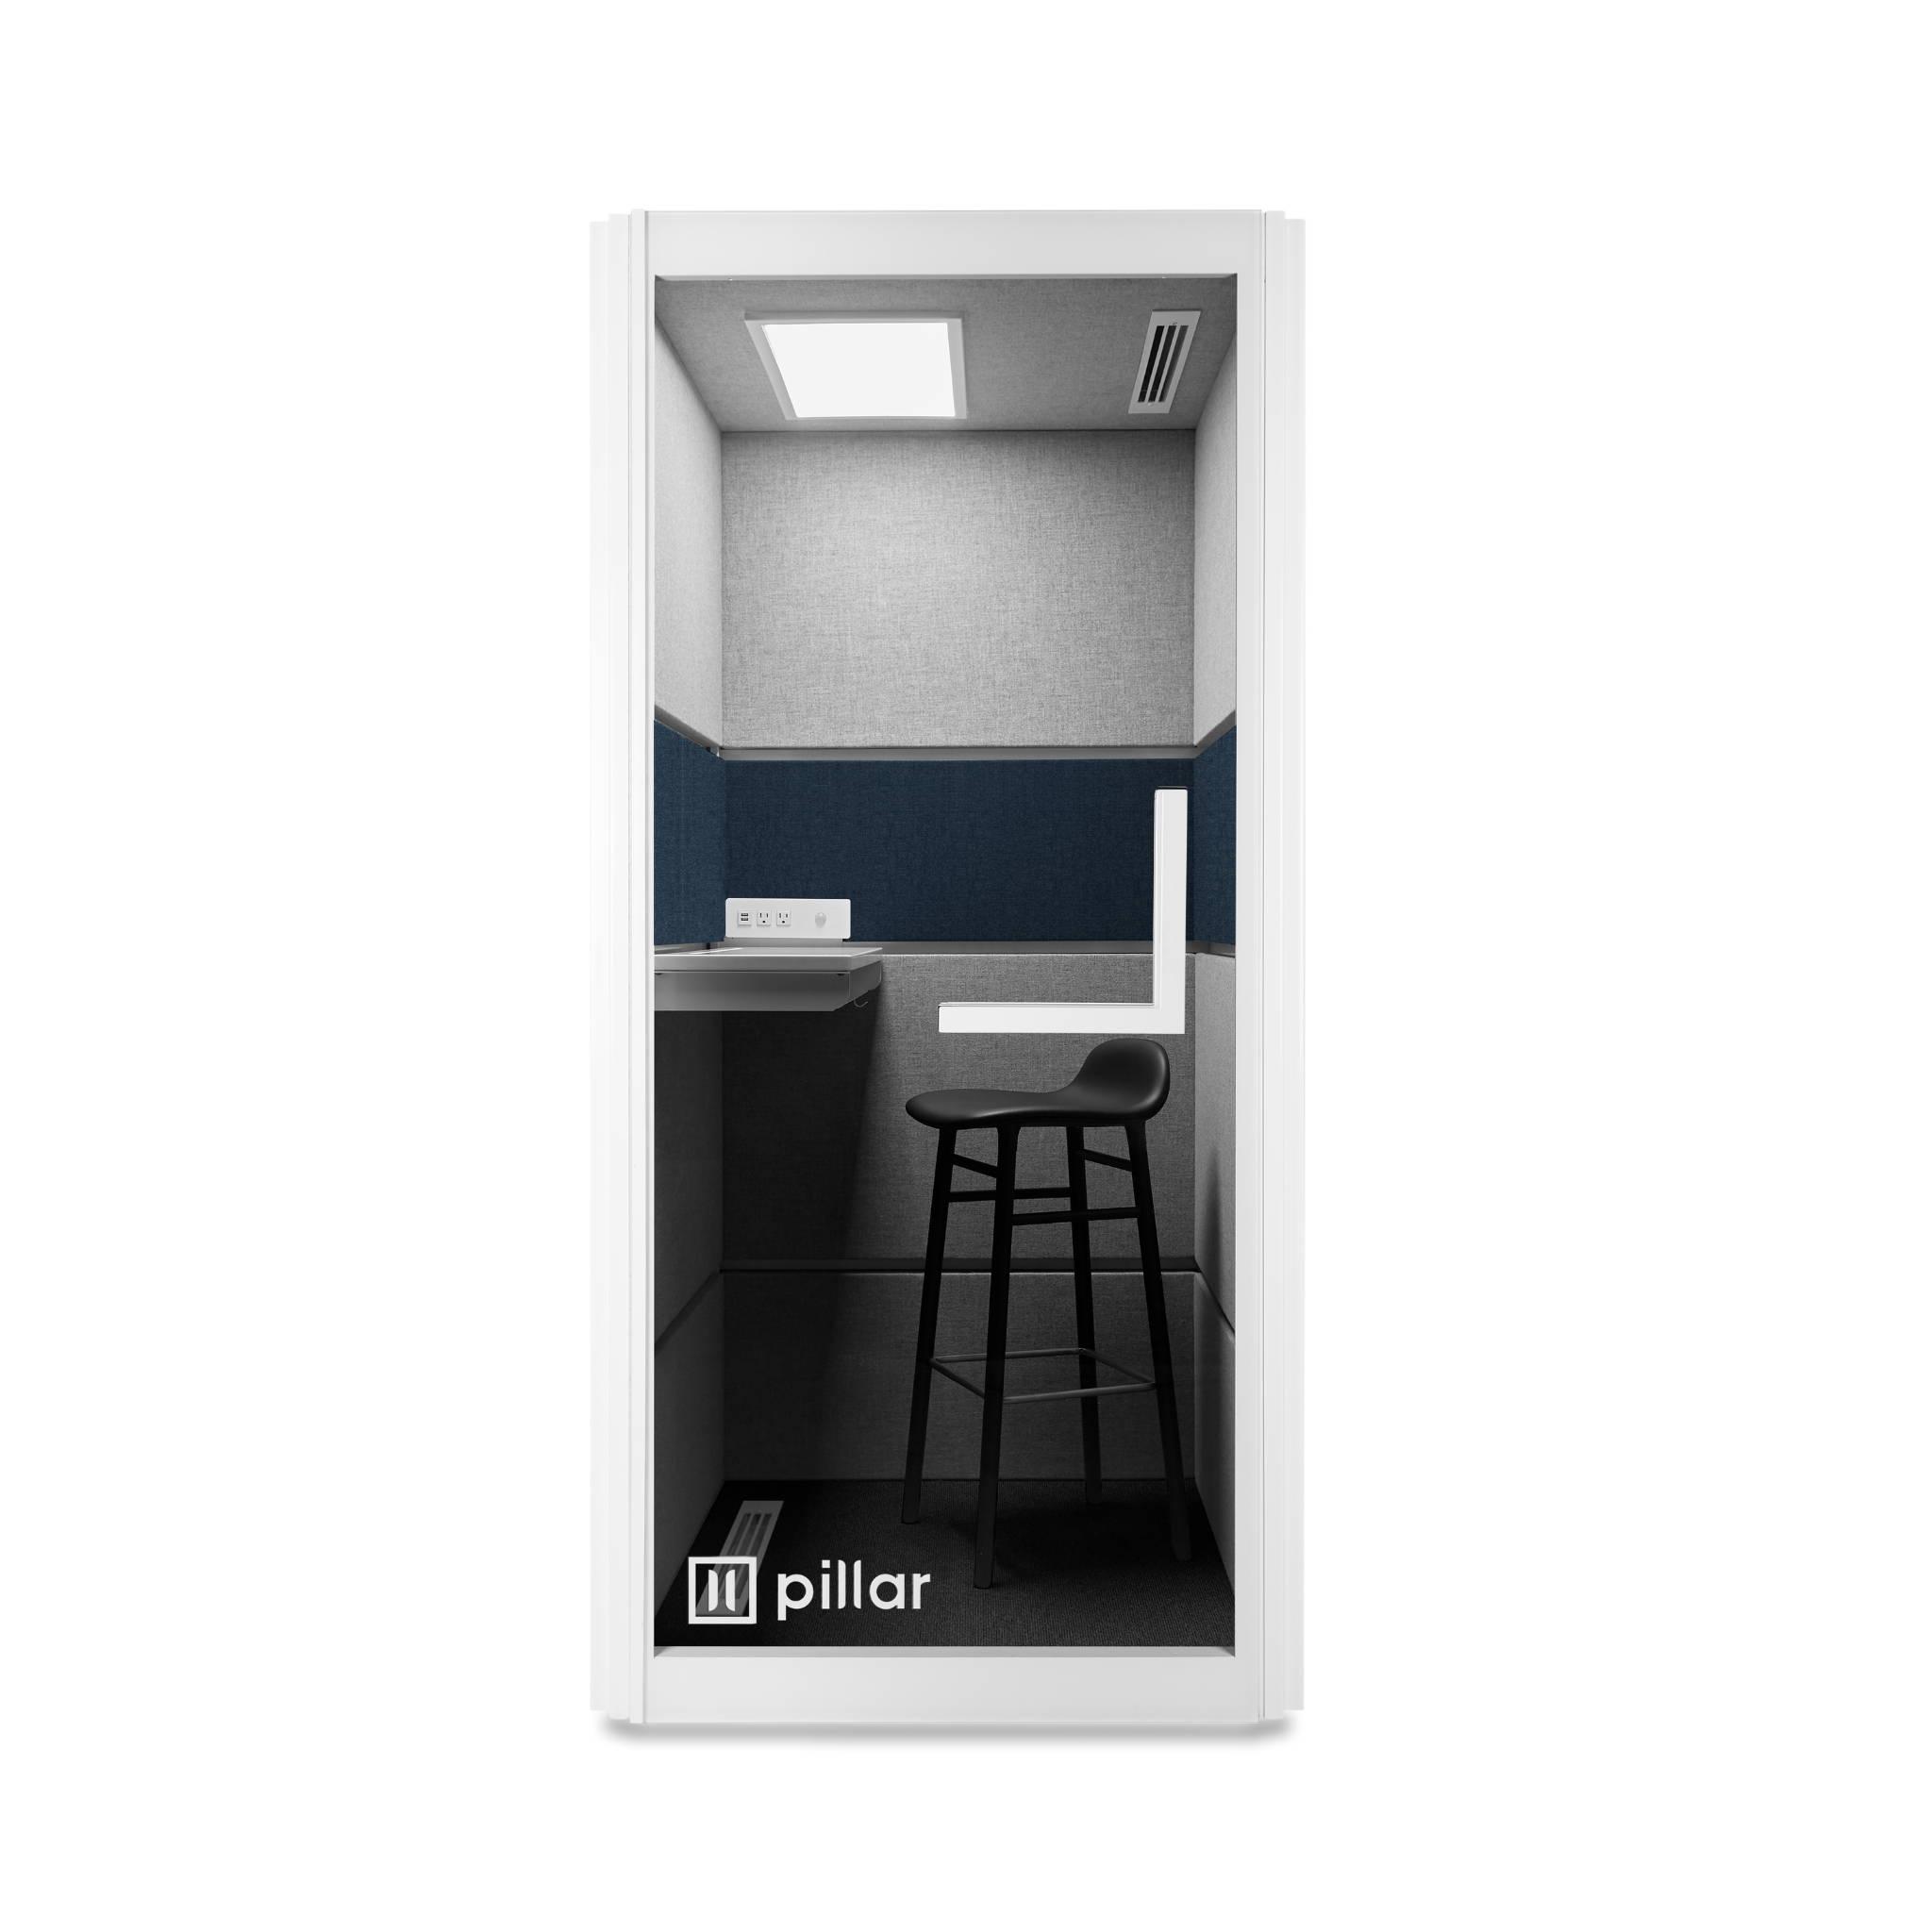 pillar booth baltic panel